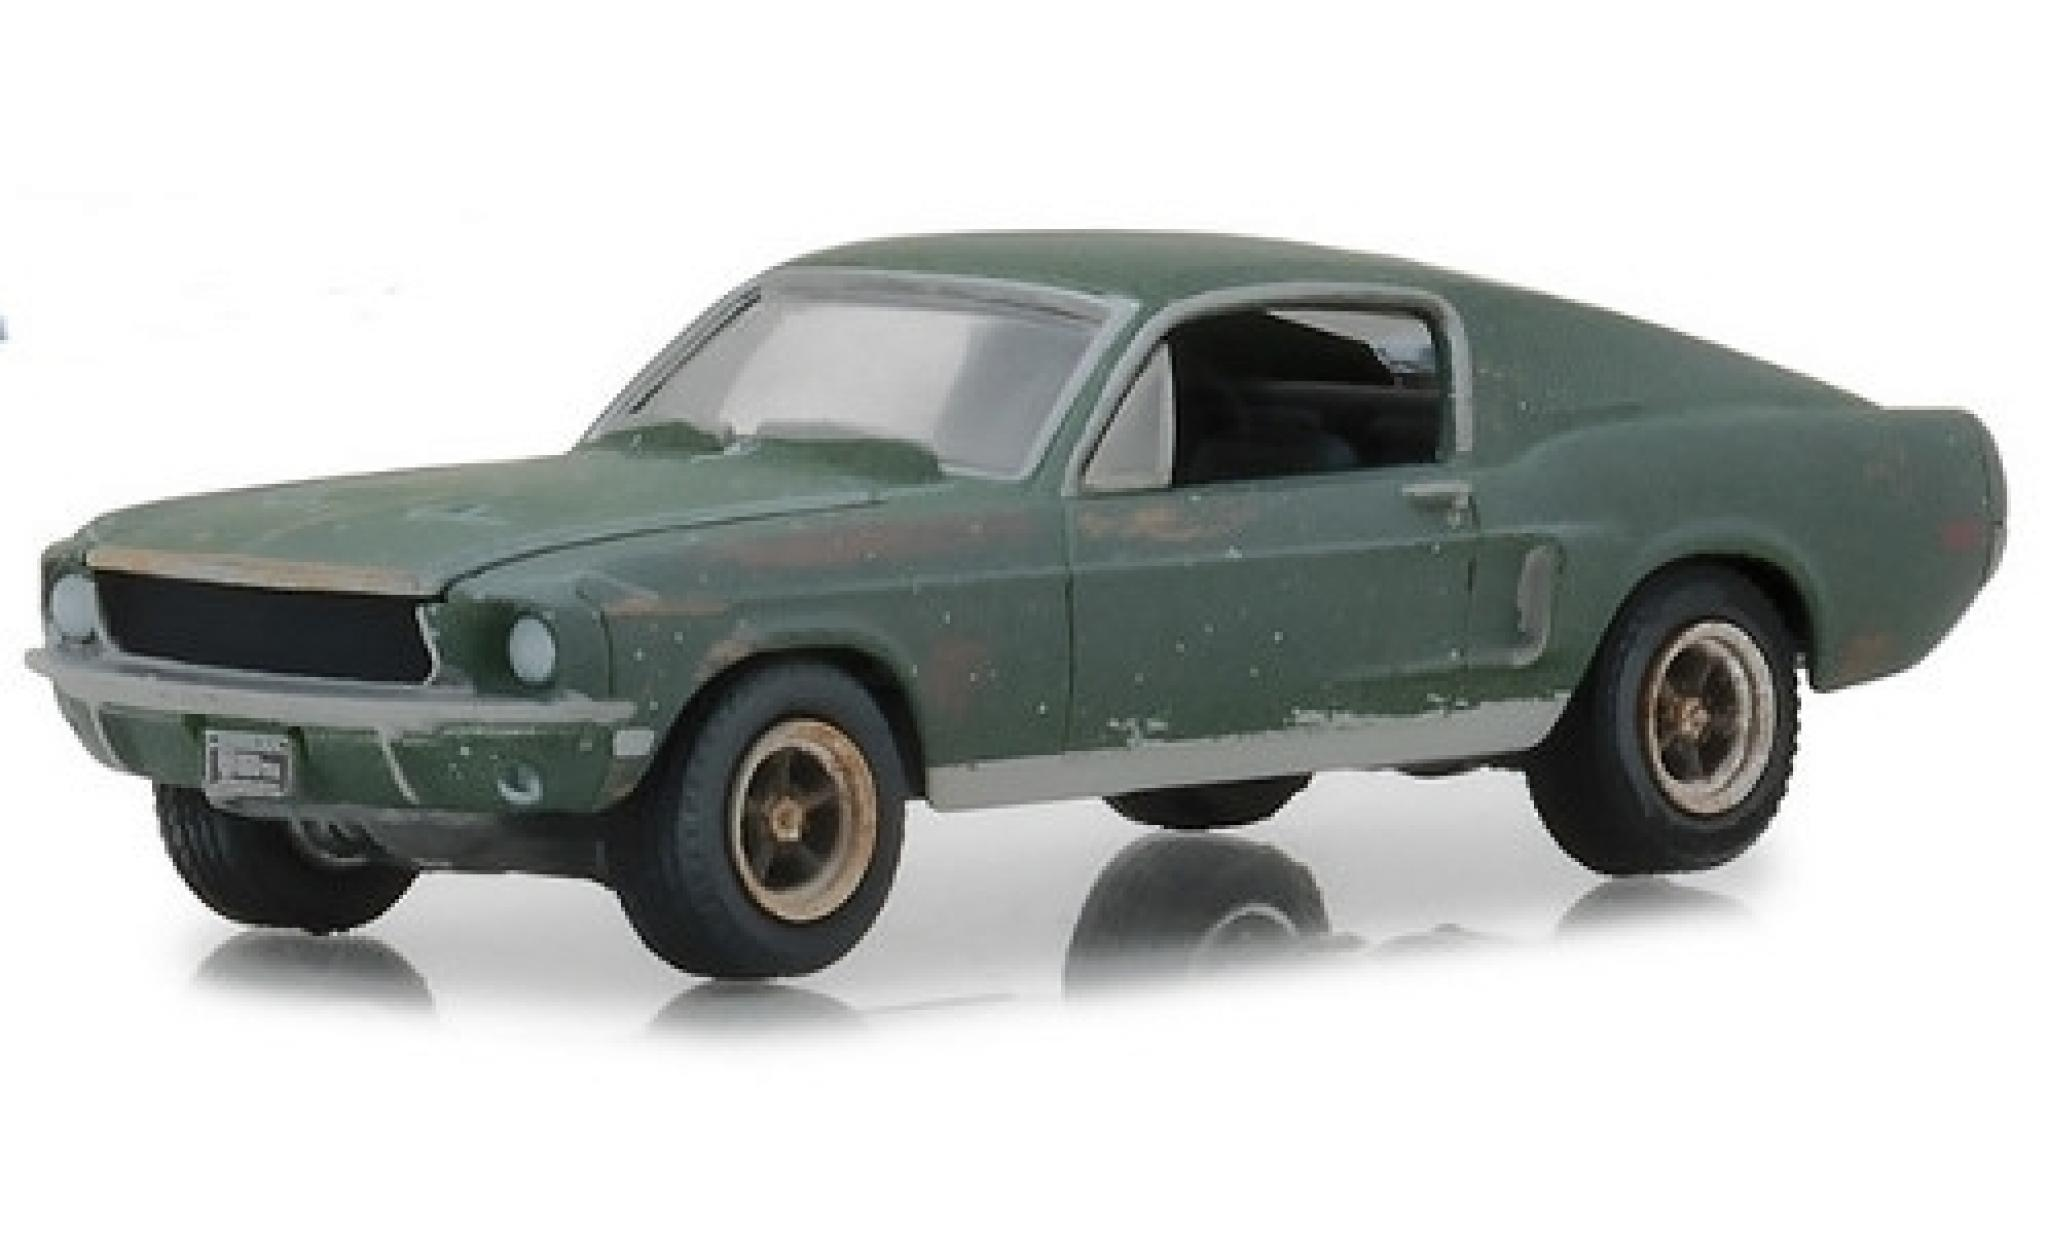 Ford Mustang GT 1/18 Greenlight Fastback unrestored verte Film Bullitt 1968 Steve McQueen